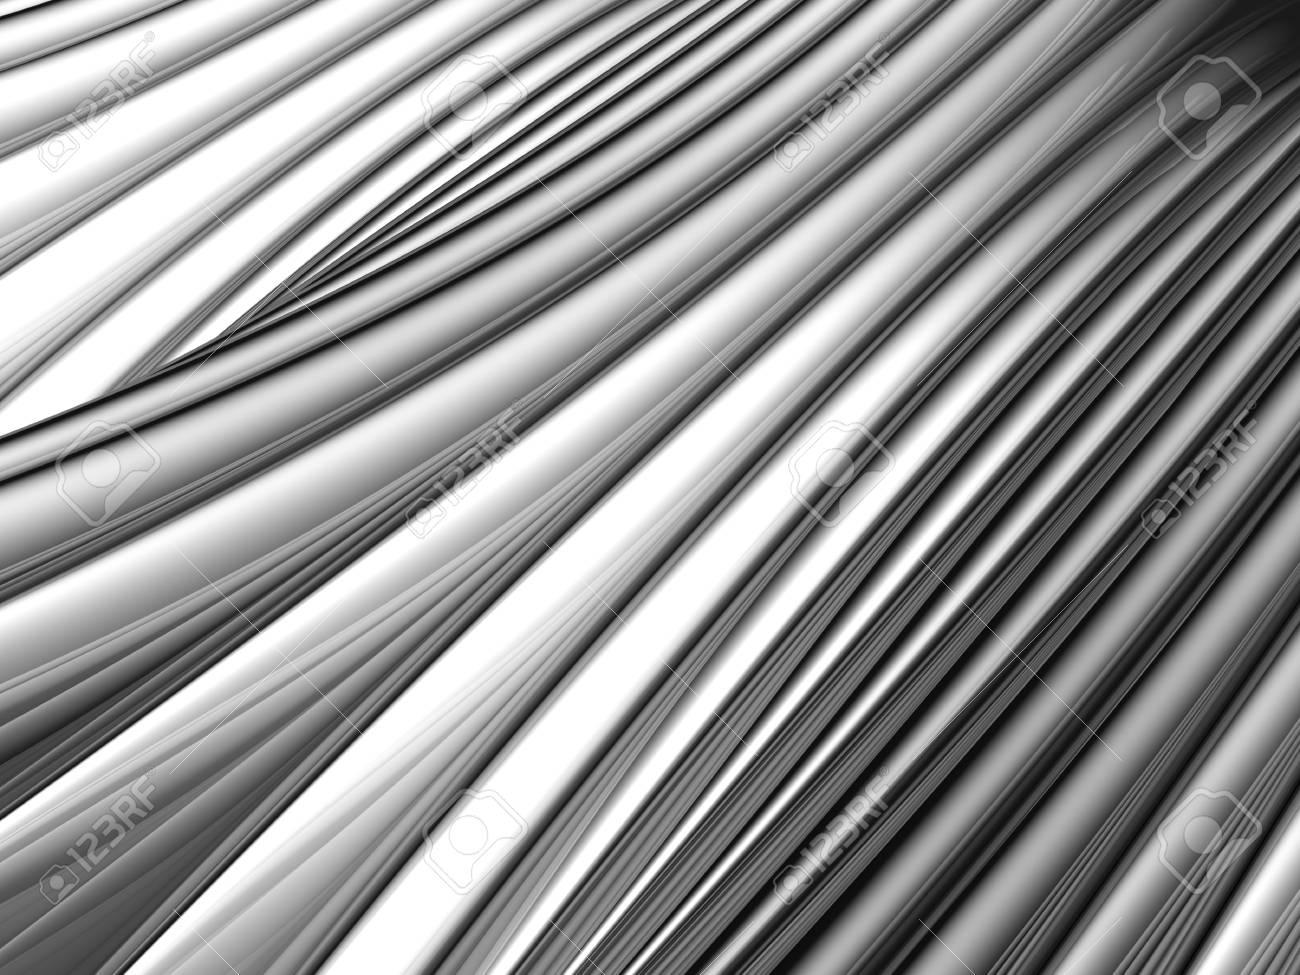 Abstract silver aluminium stripe background 3d illustration Stock Photo - 9501638